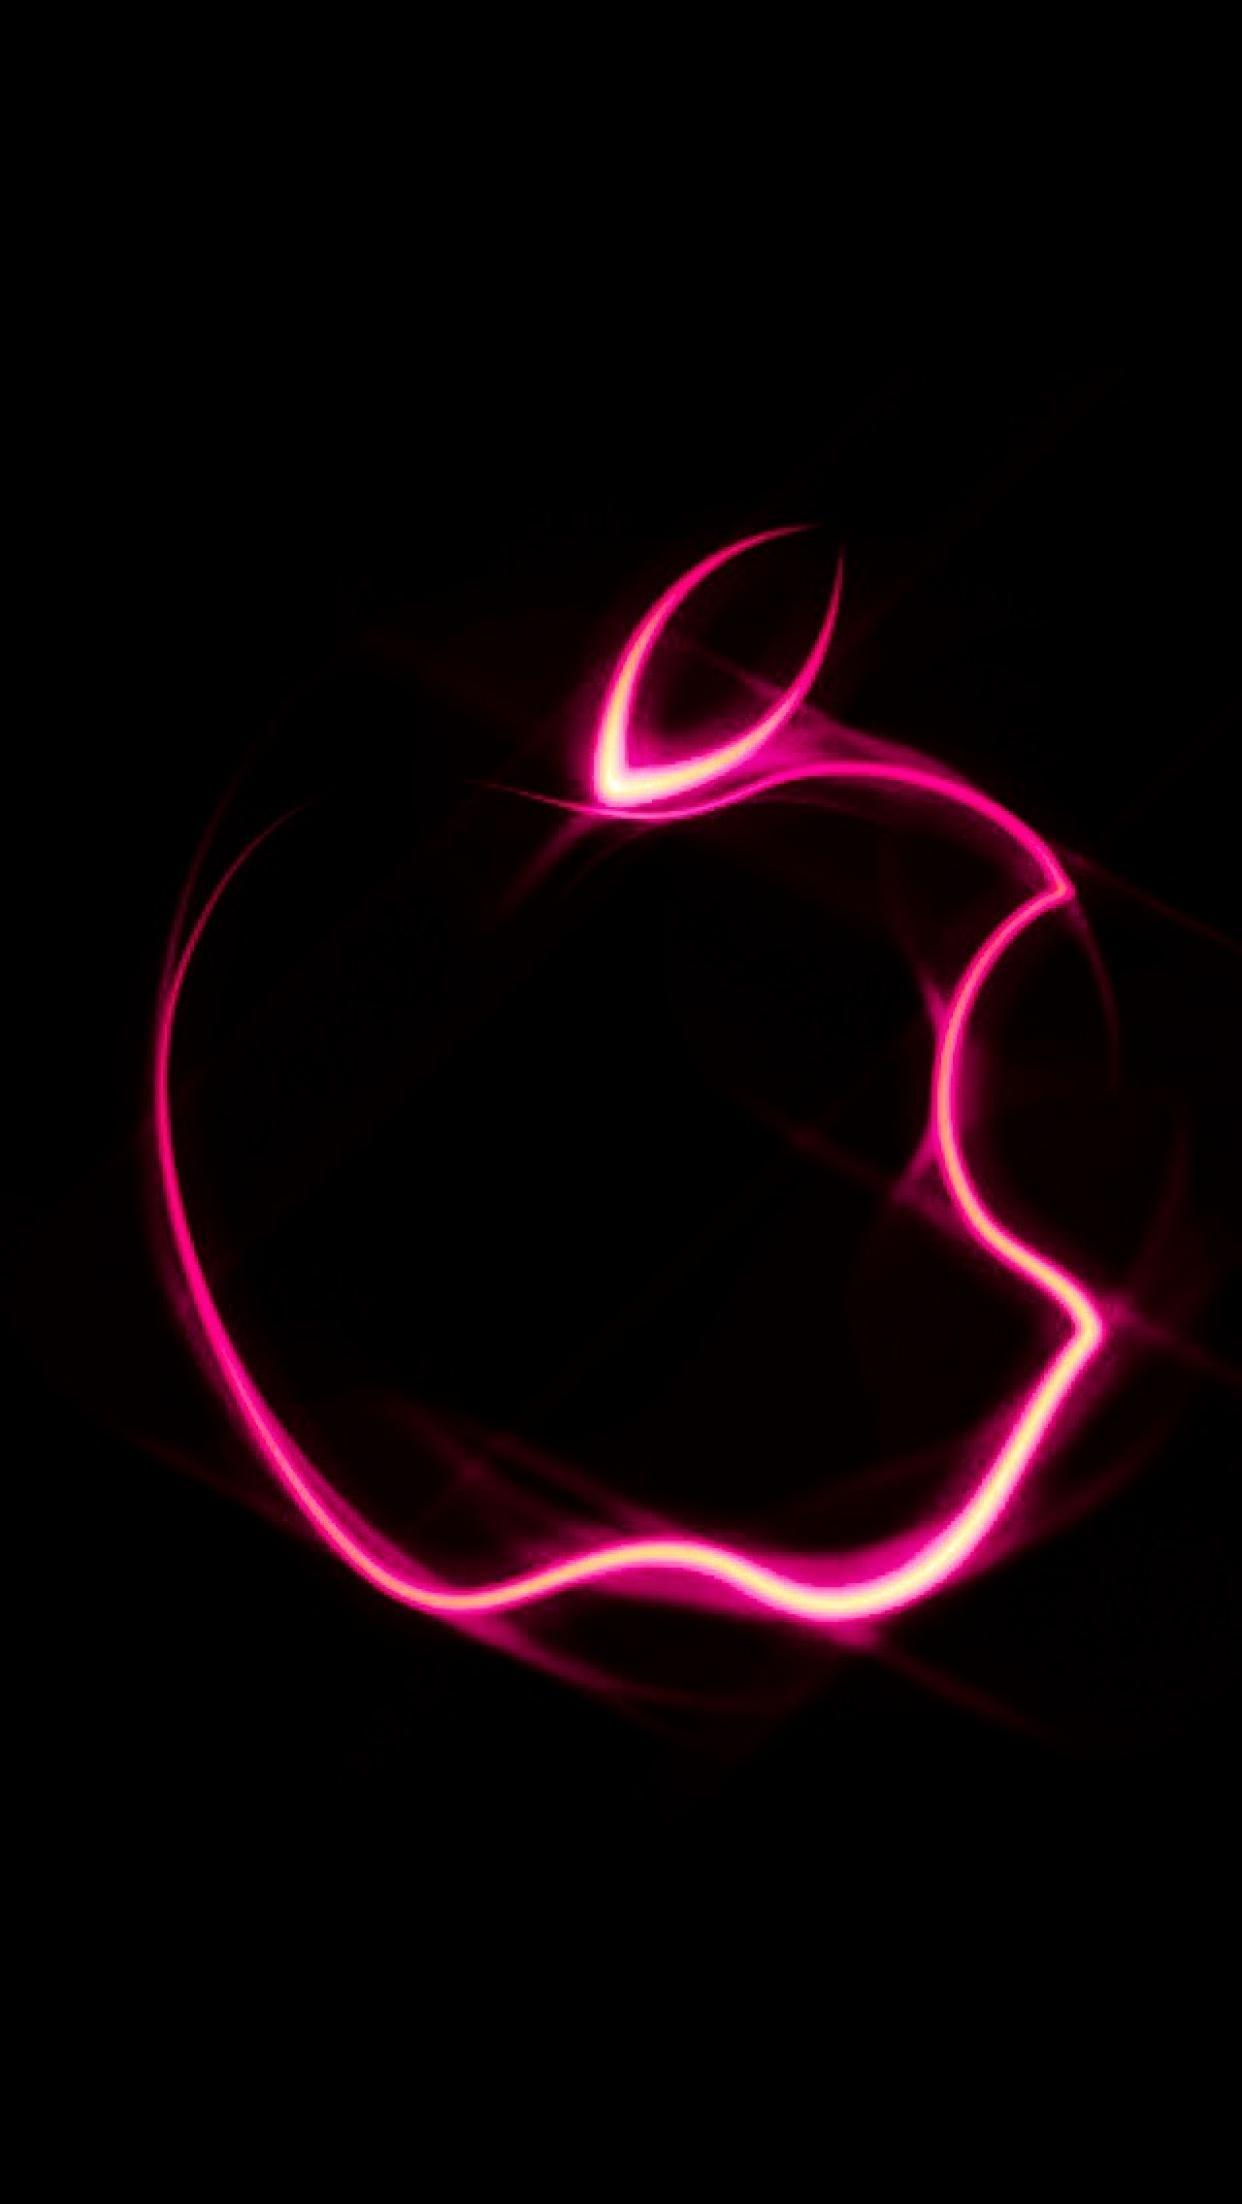 iphone 6 retina wallpaper Apple logo wallpaper